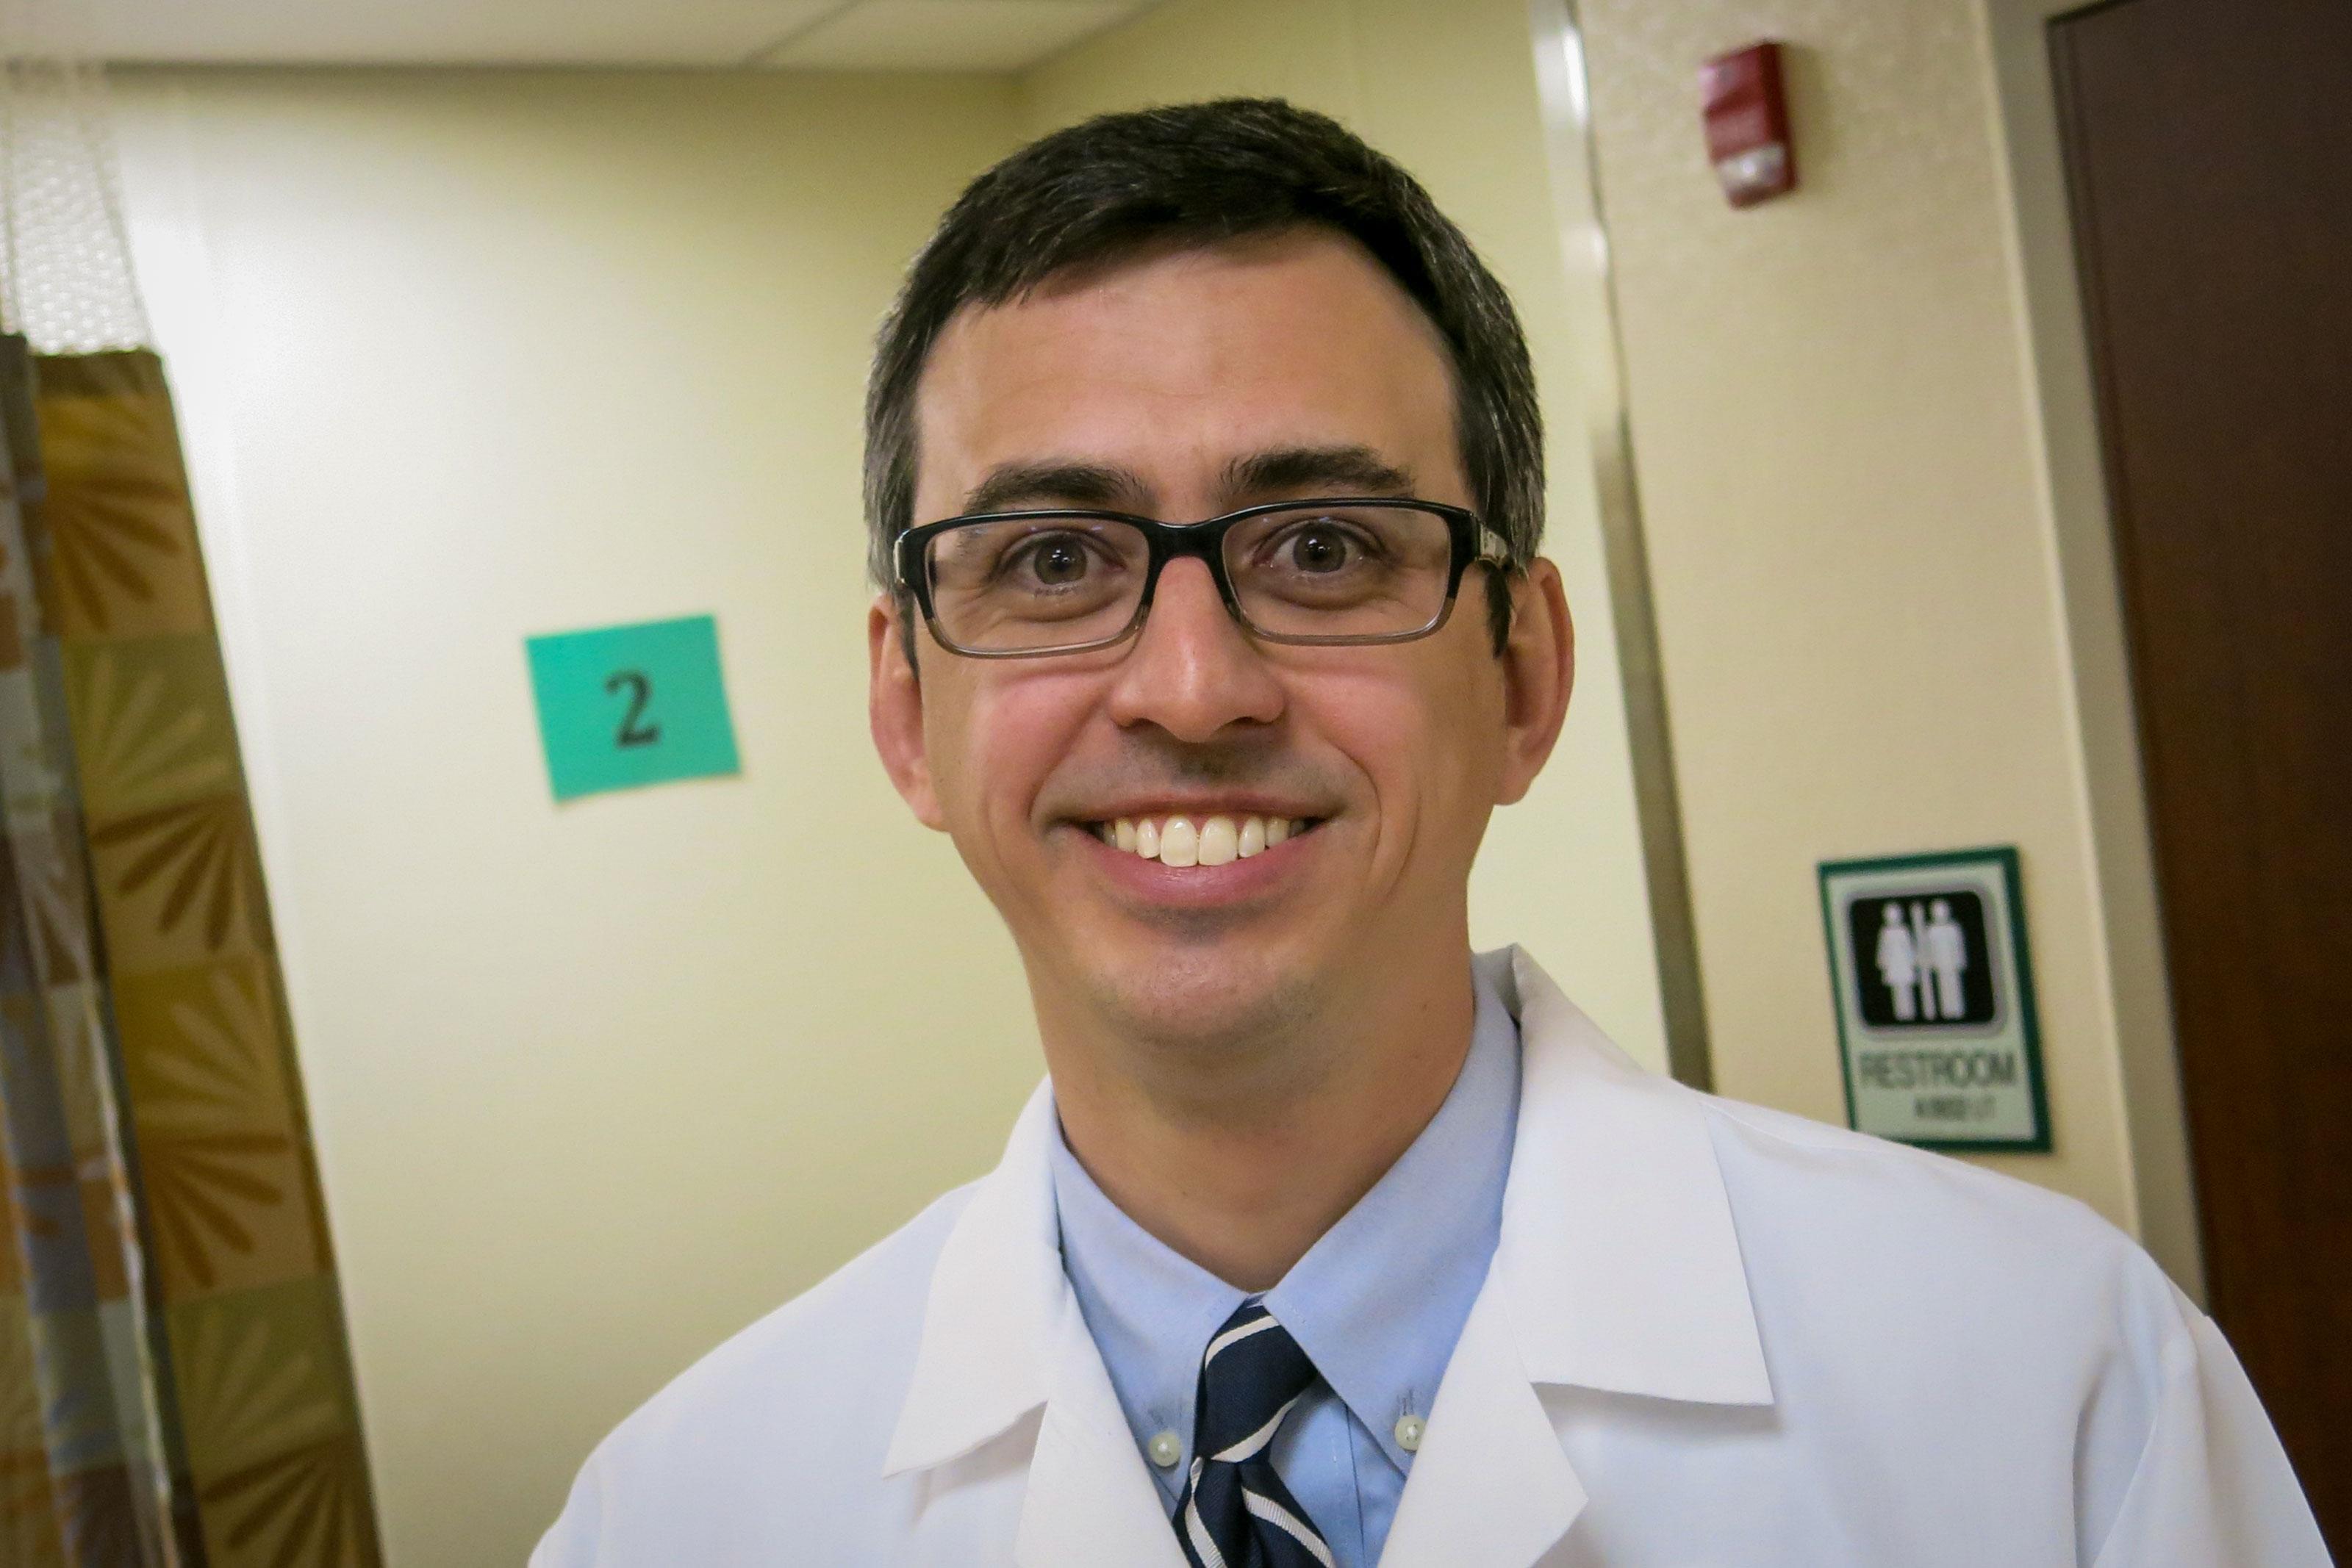 Photo: Treatment On Demand 3 | Dr. Scott Simpson - JDaley